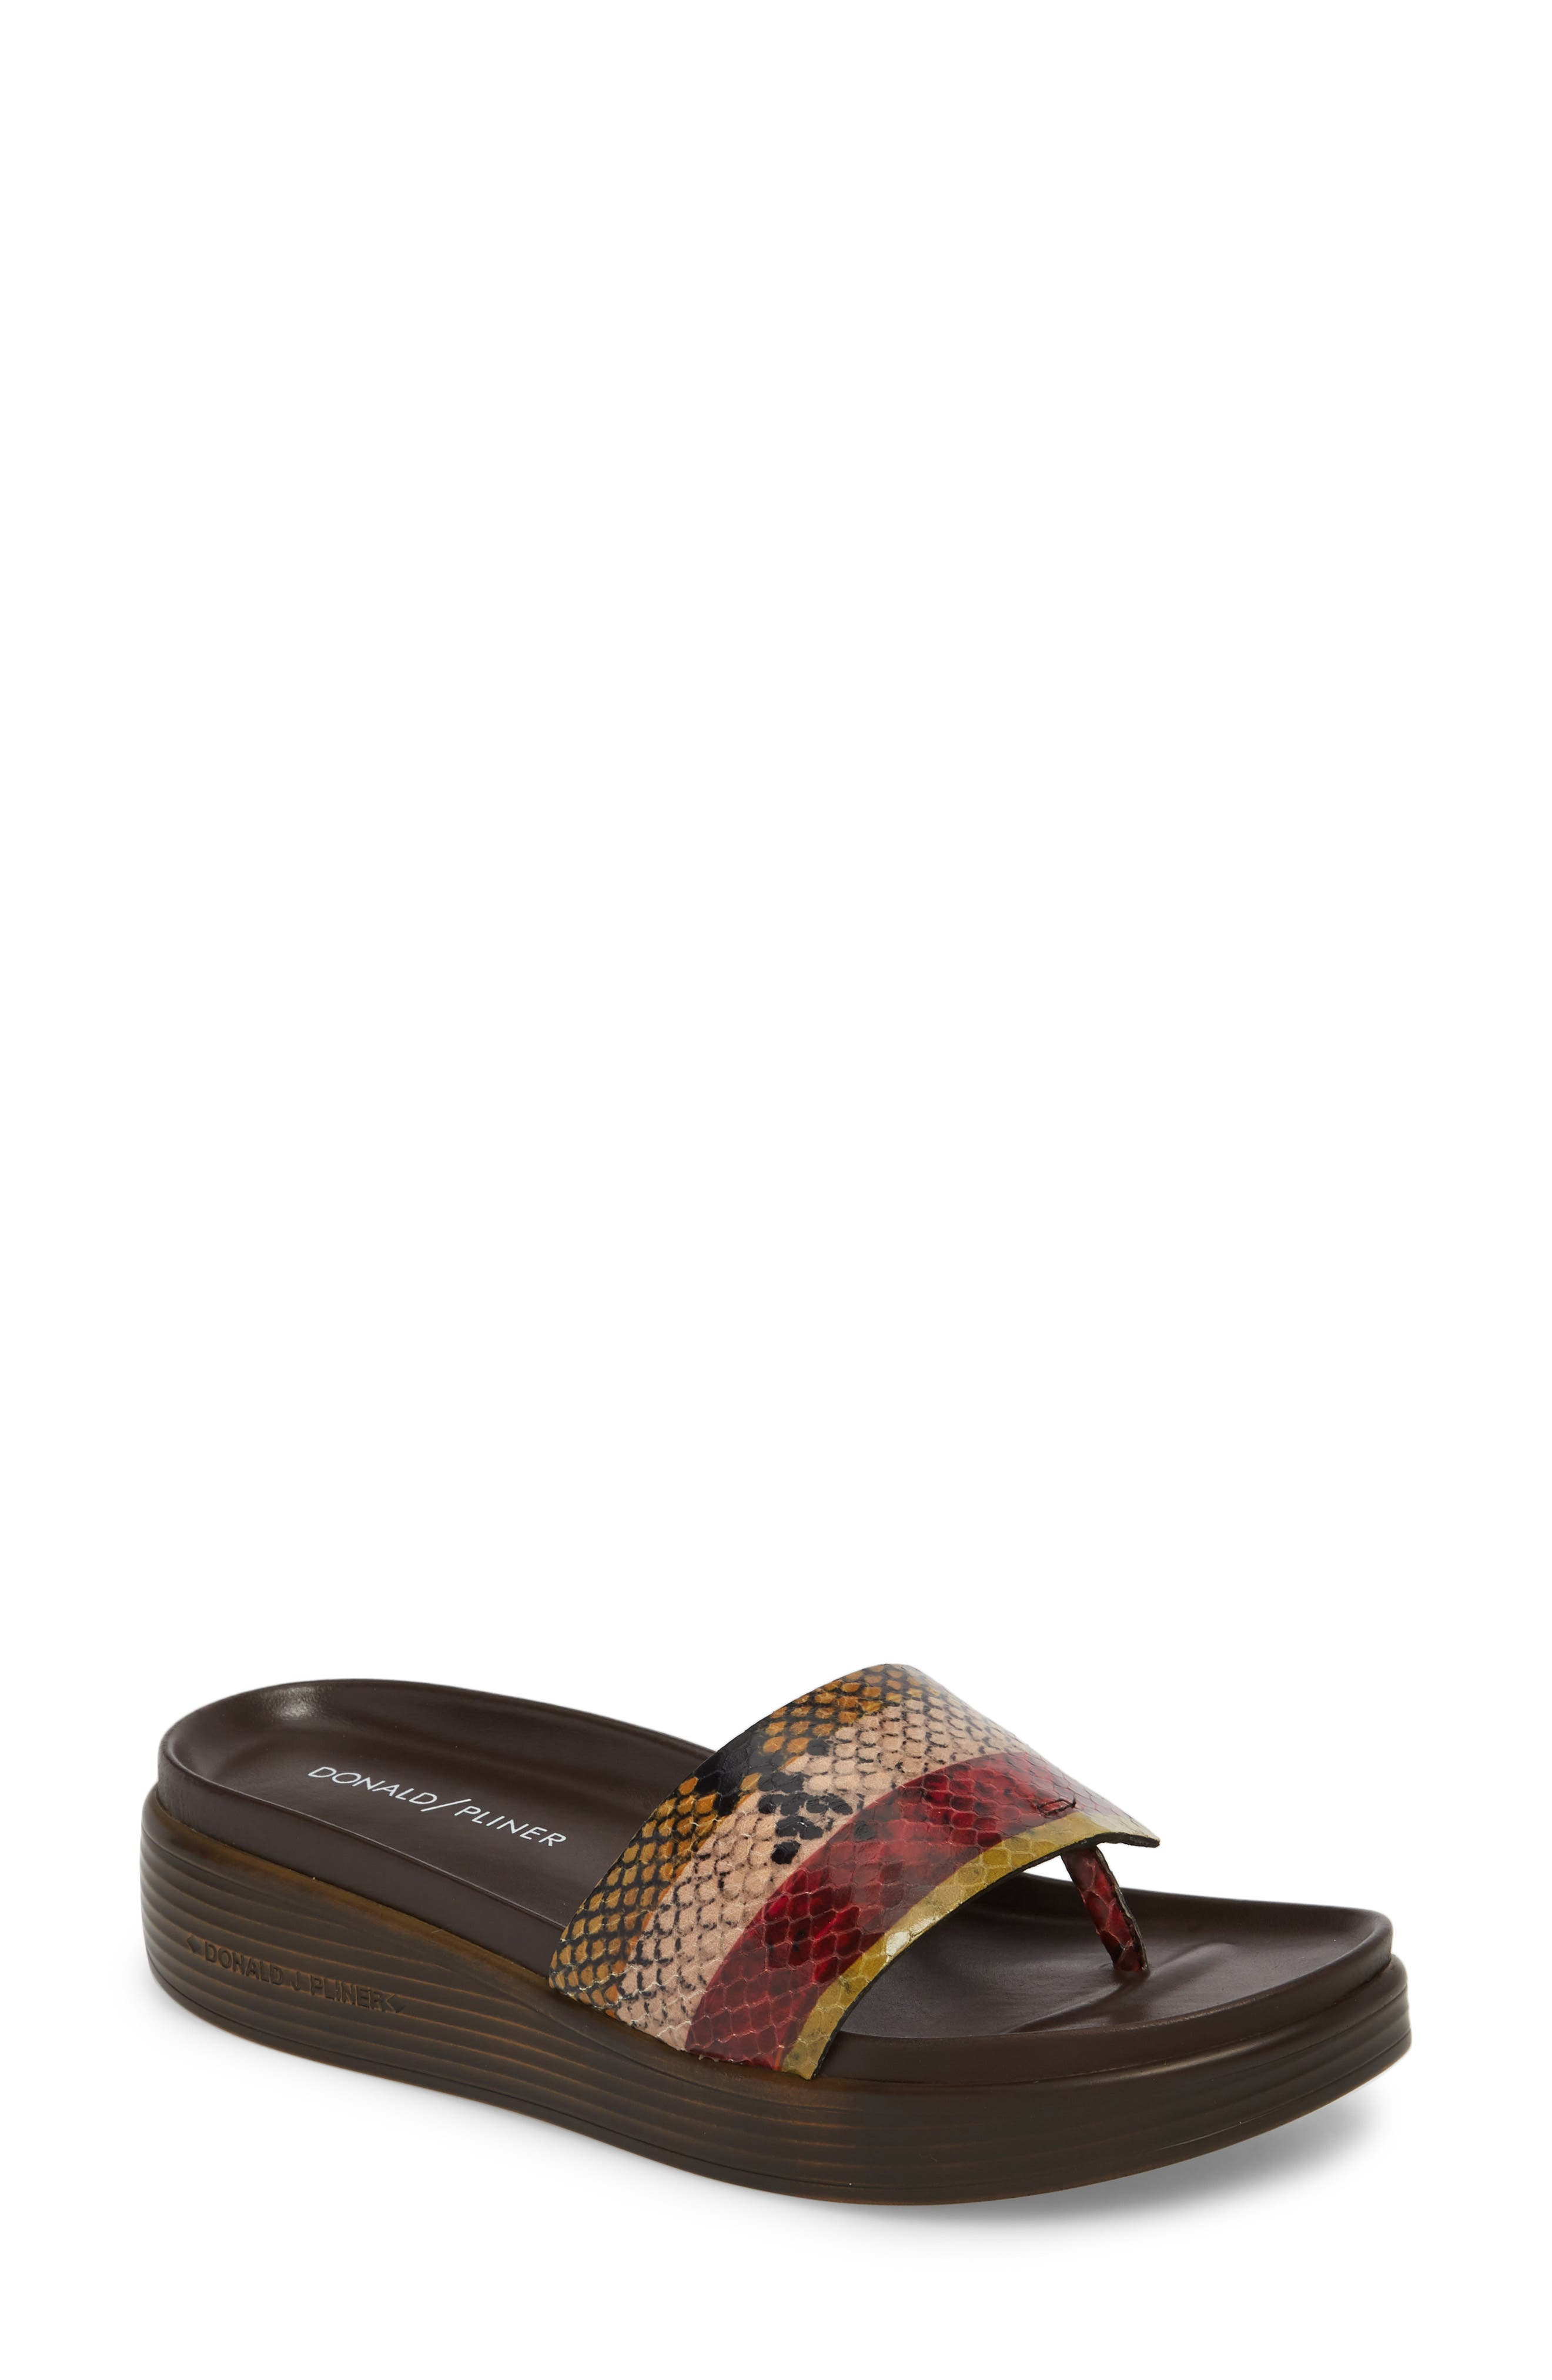 Fifi Slide Sandal,                         Main,                         color, Fawn Leather